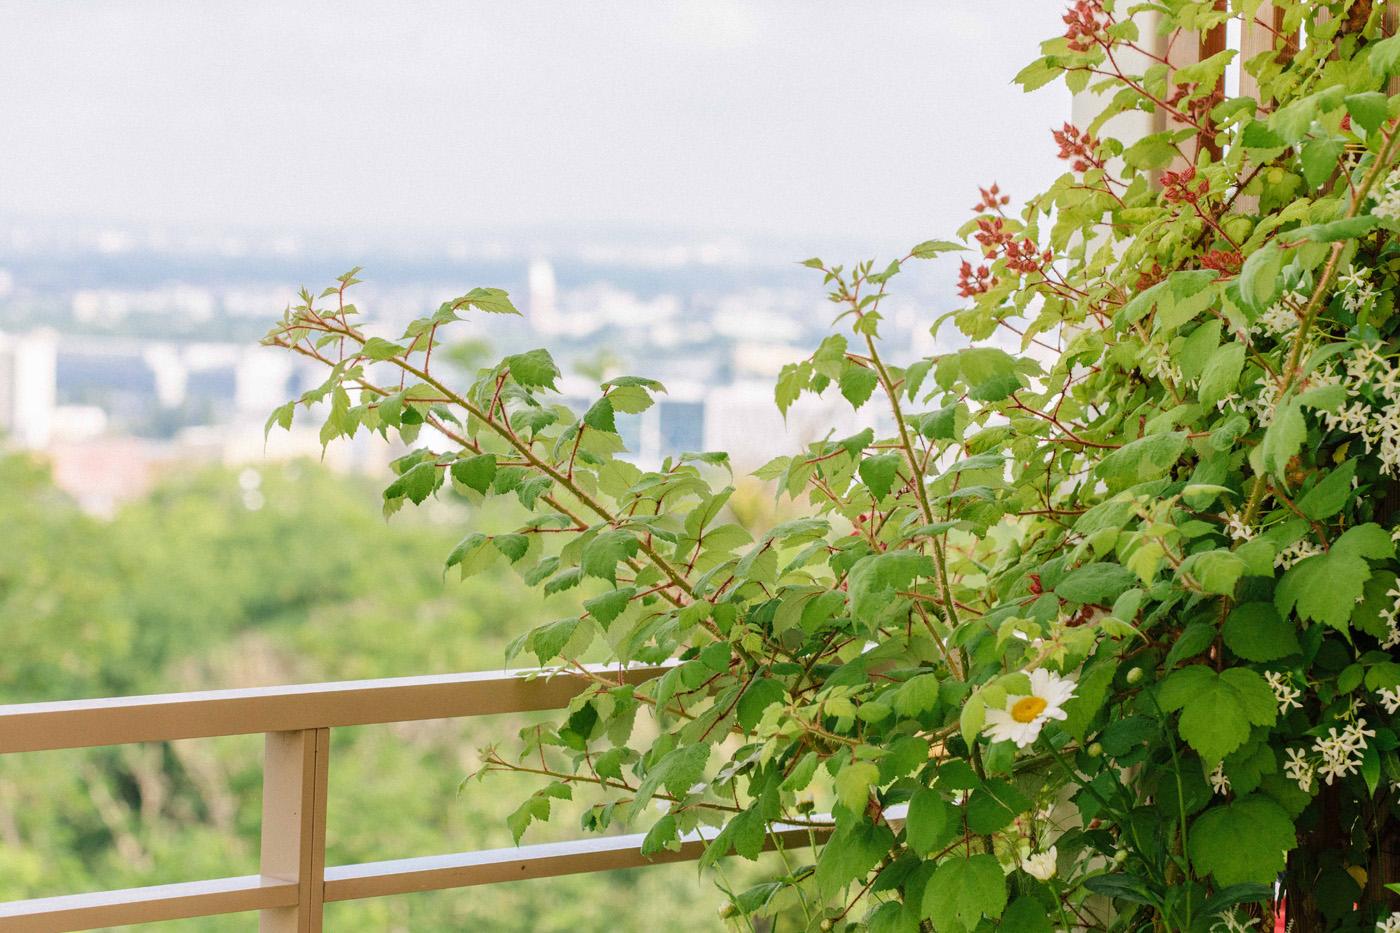 158-Lili Garden Terrasse Romainville Vegetaux